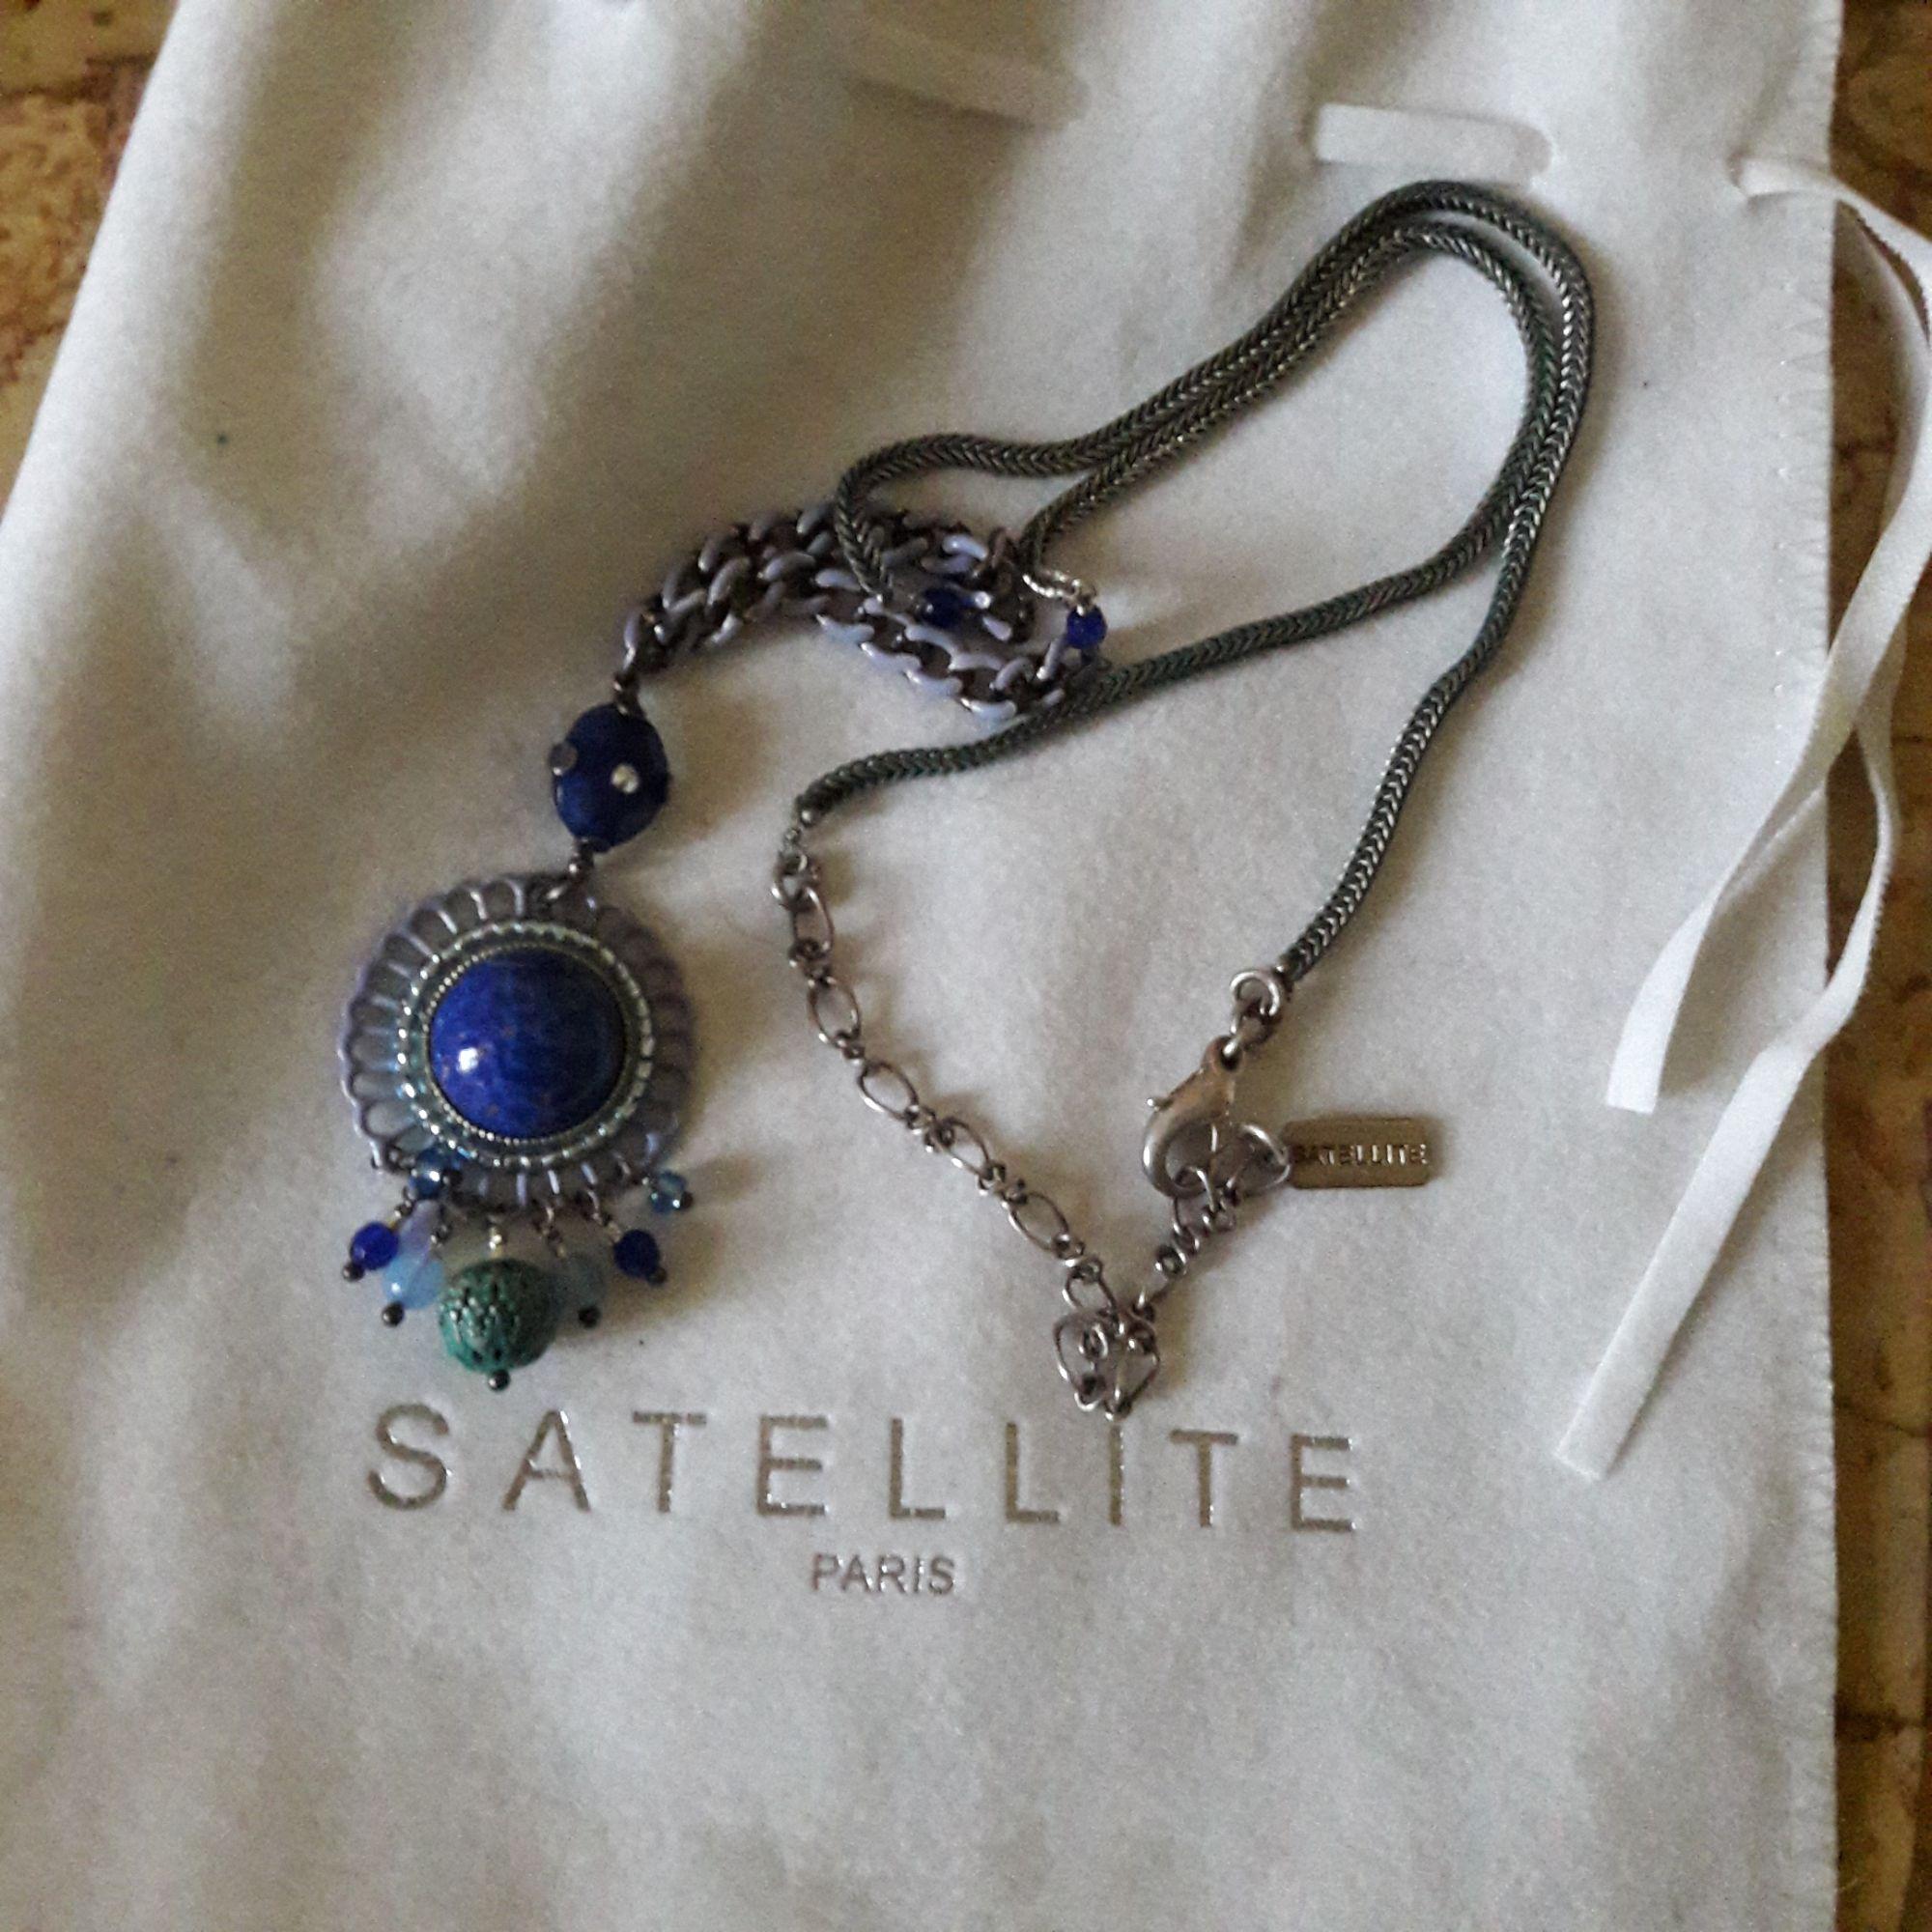 Pendentif, collier pendentif SATELLITE Bleu, bleu marine, bleu turquoise